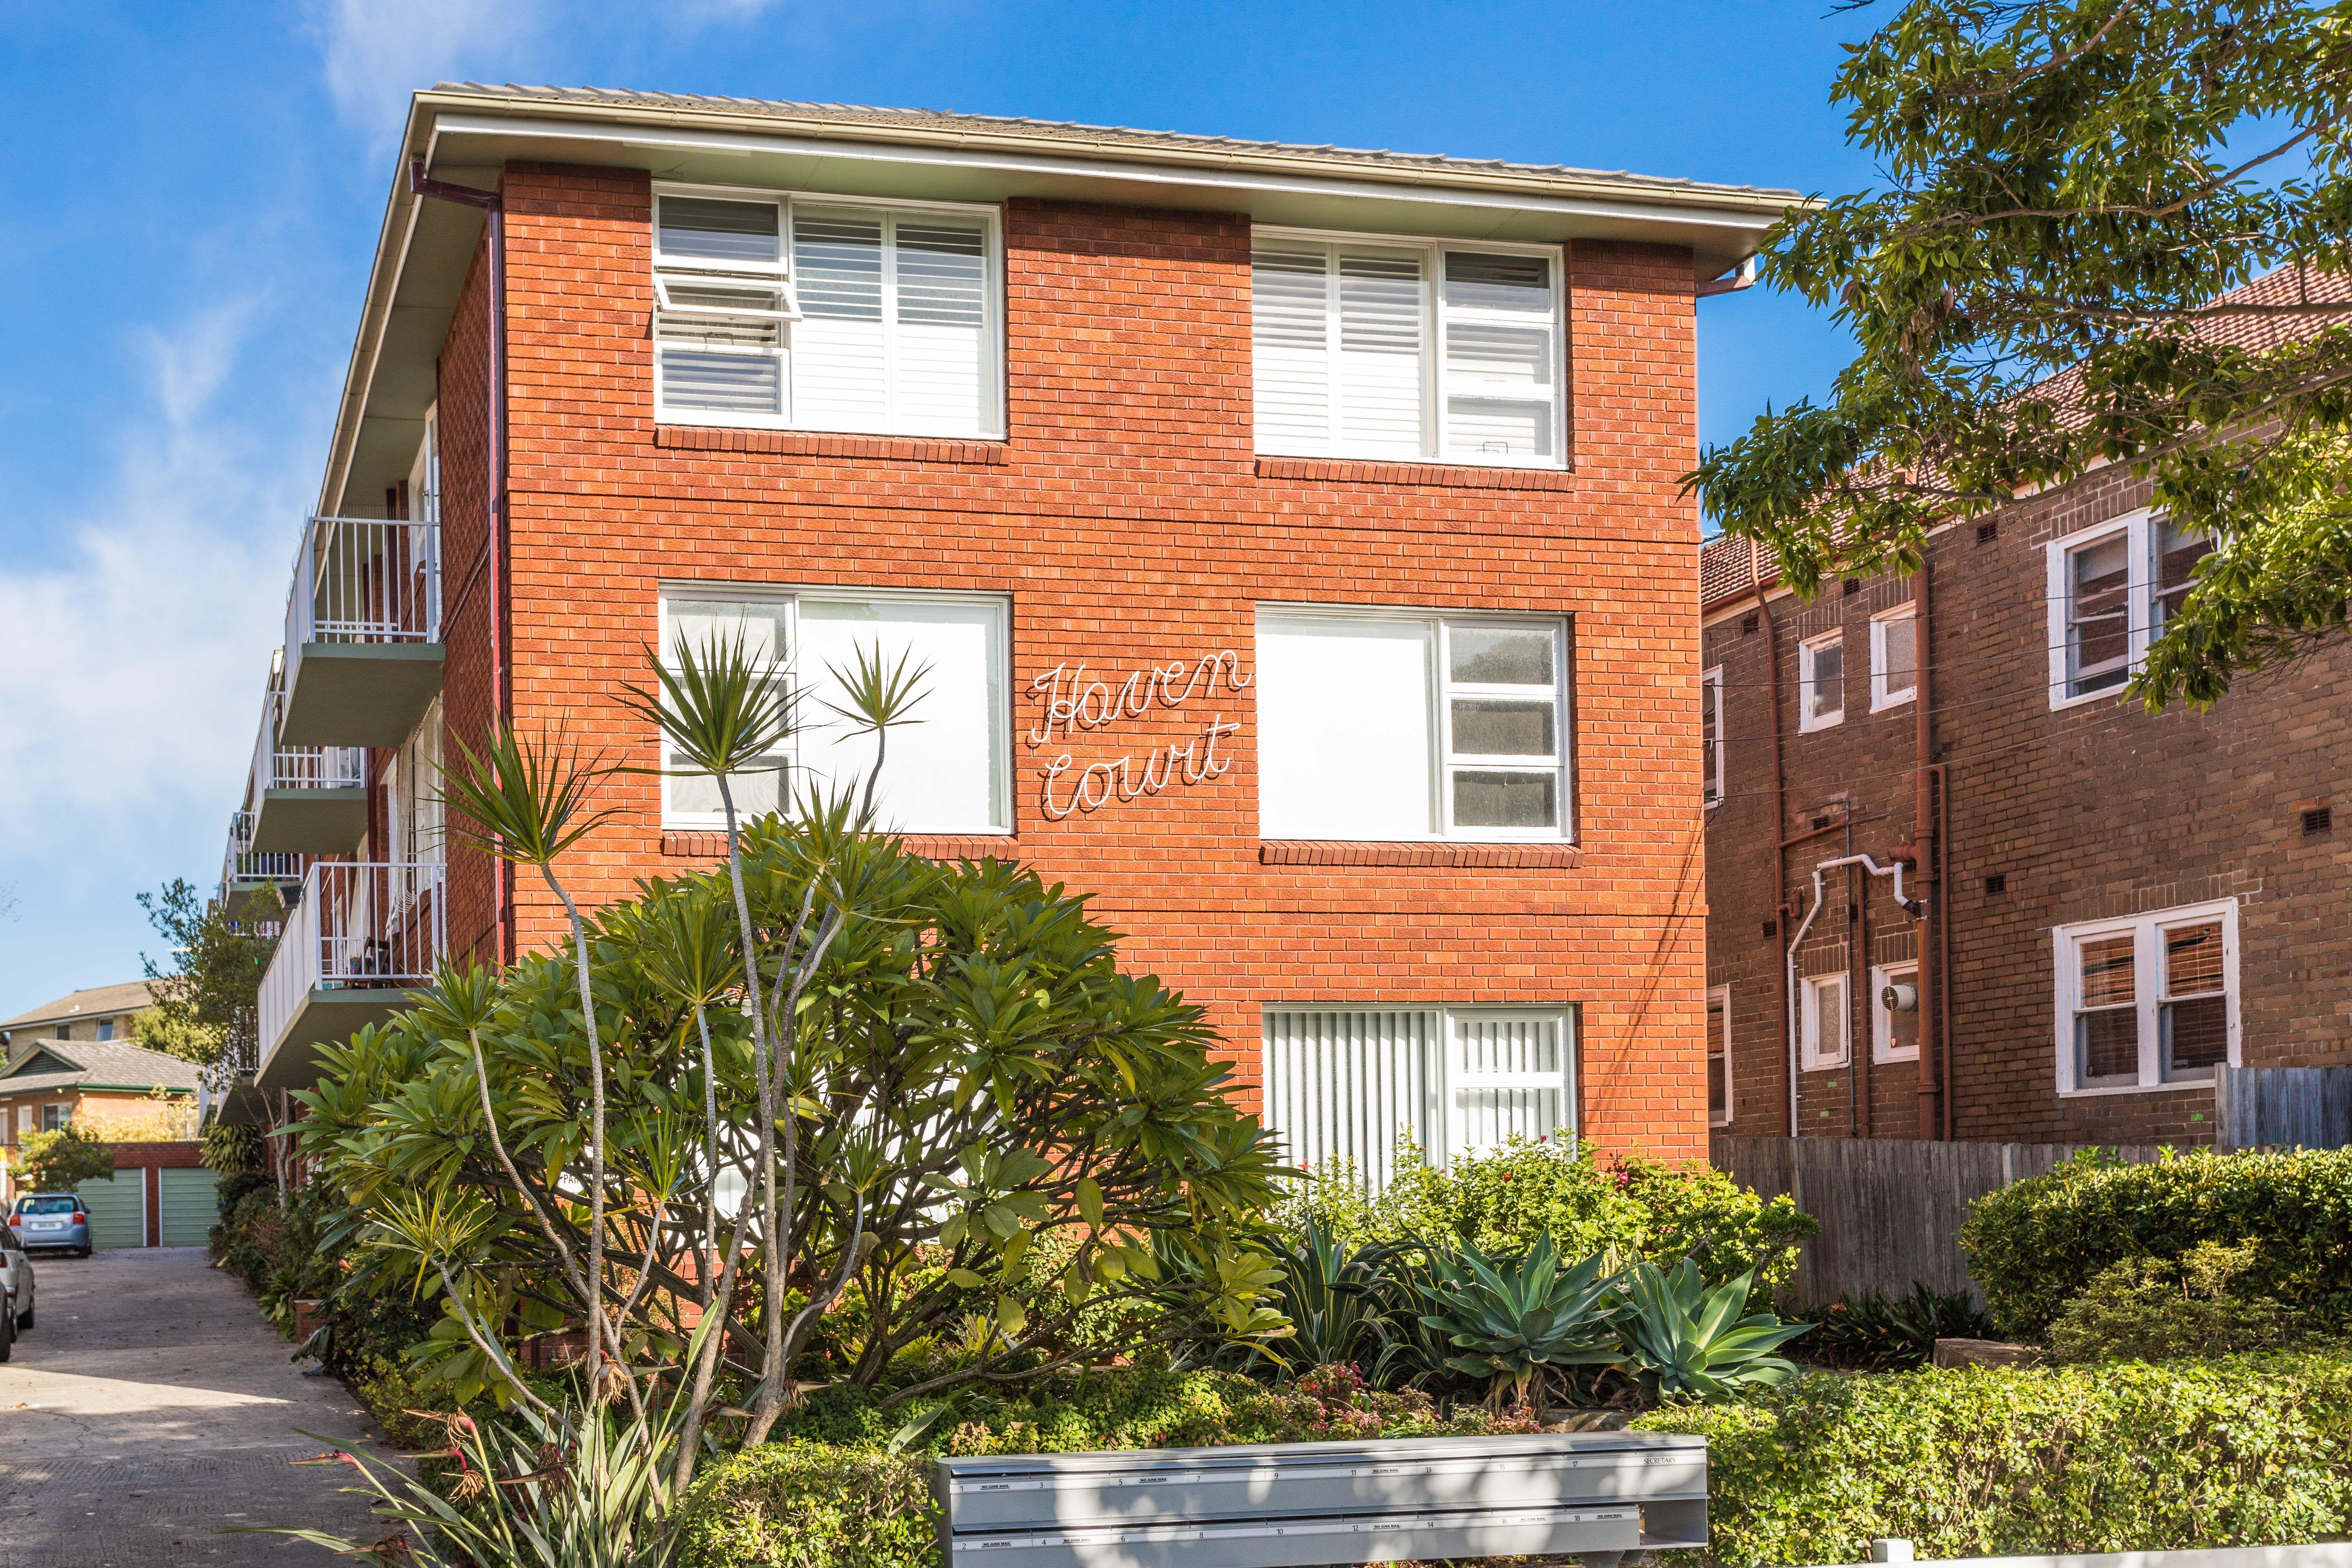 12/20 Gower Street, Summer Hill NSW 2130